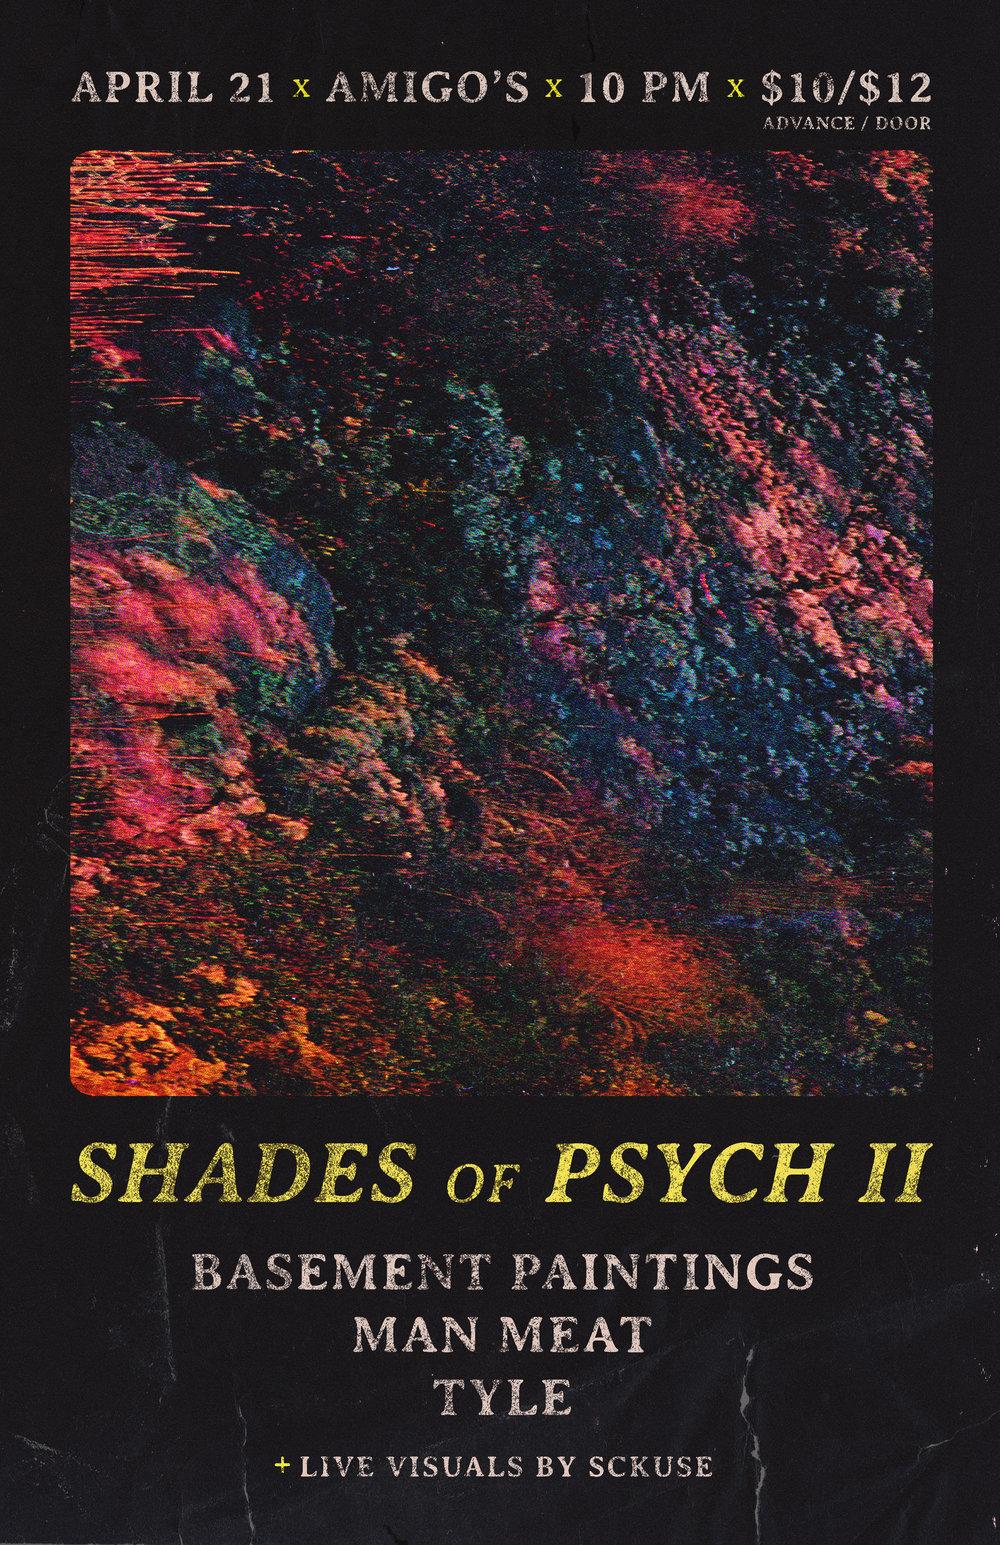 SHADES-OF-PSYCH_POSTER_EDITS.jpg